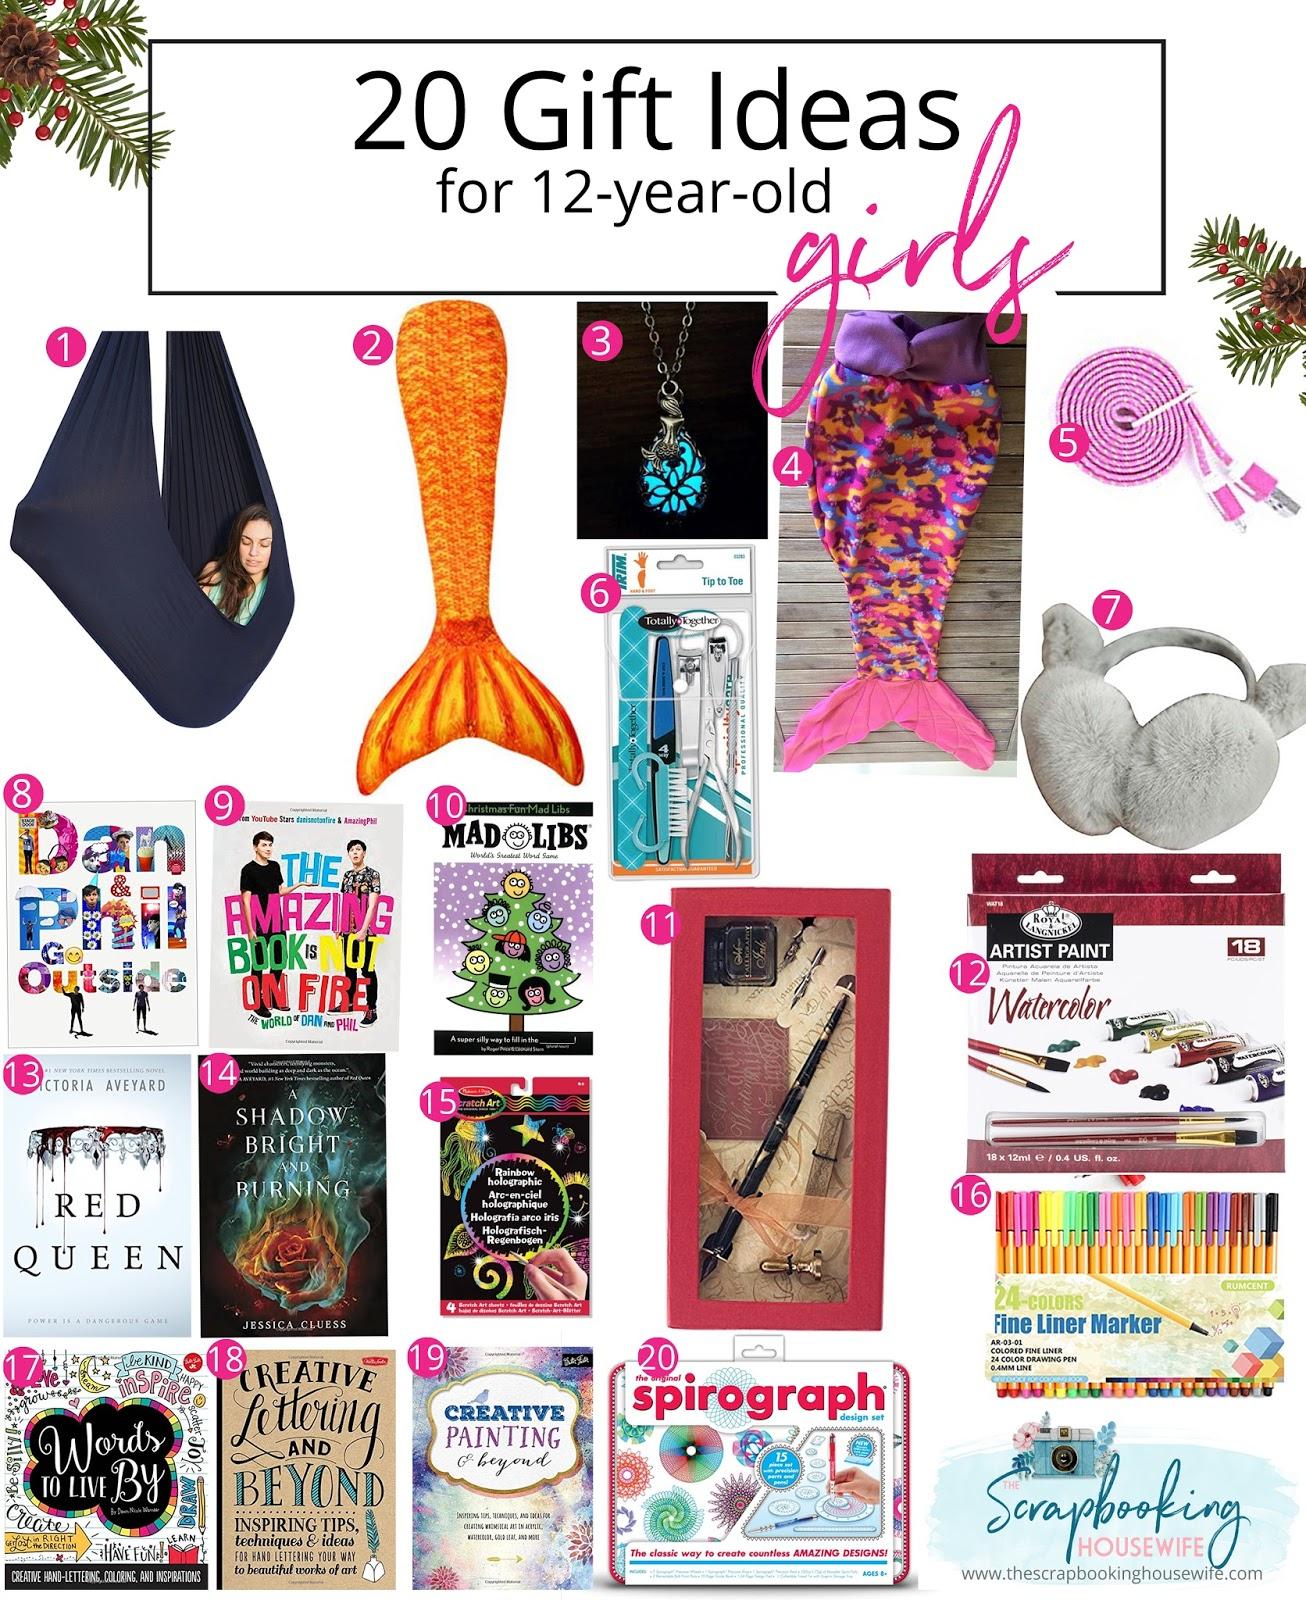 10 Elegant Gift Ideas 12 Year Girl ellabella designs 20 gift ideas for 12 year old tween girls gift guide 2020